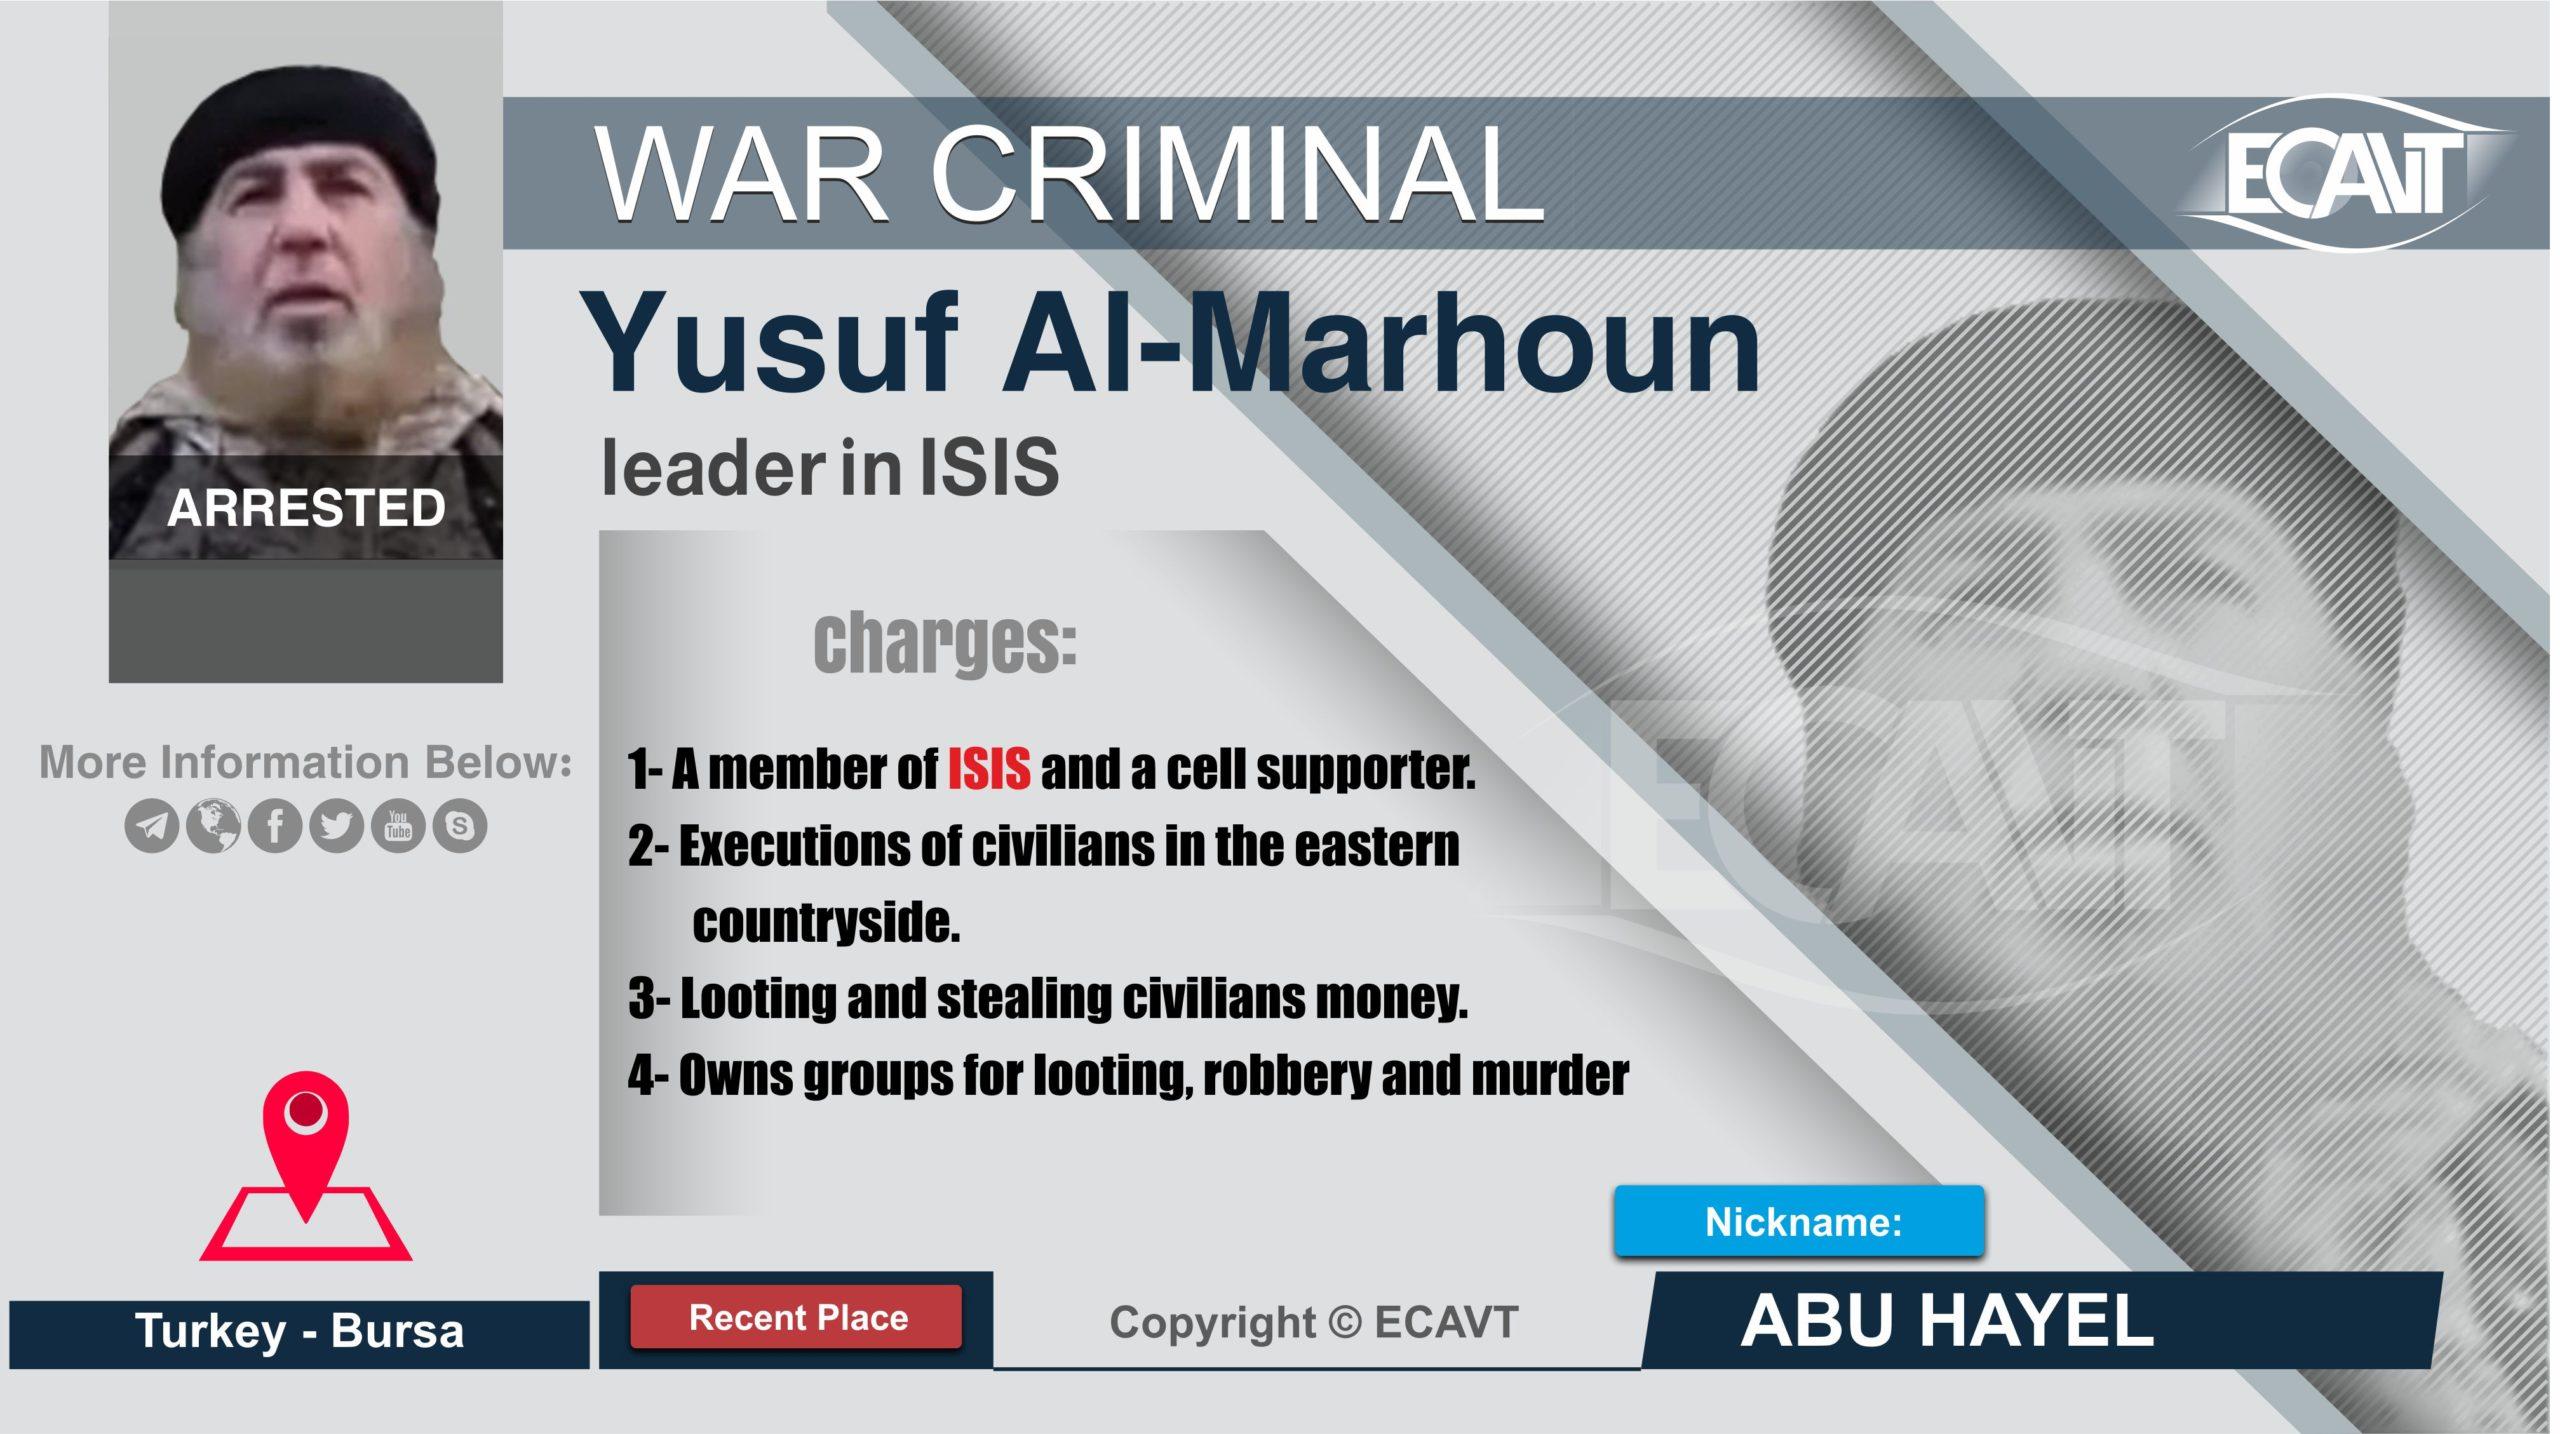 Yusuf Al-Marhoun